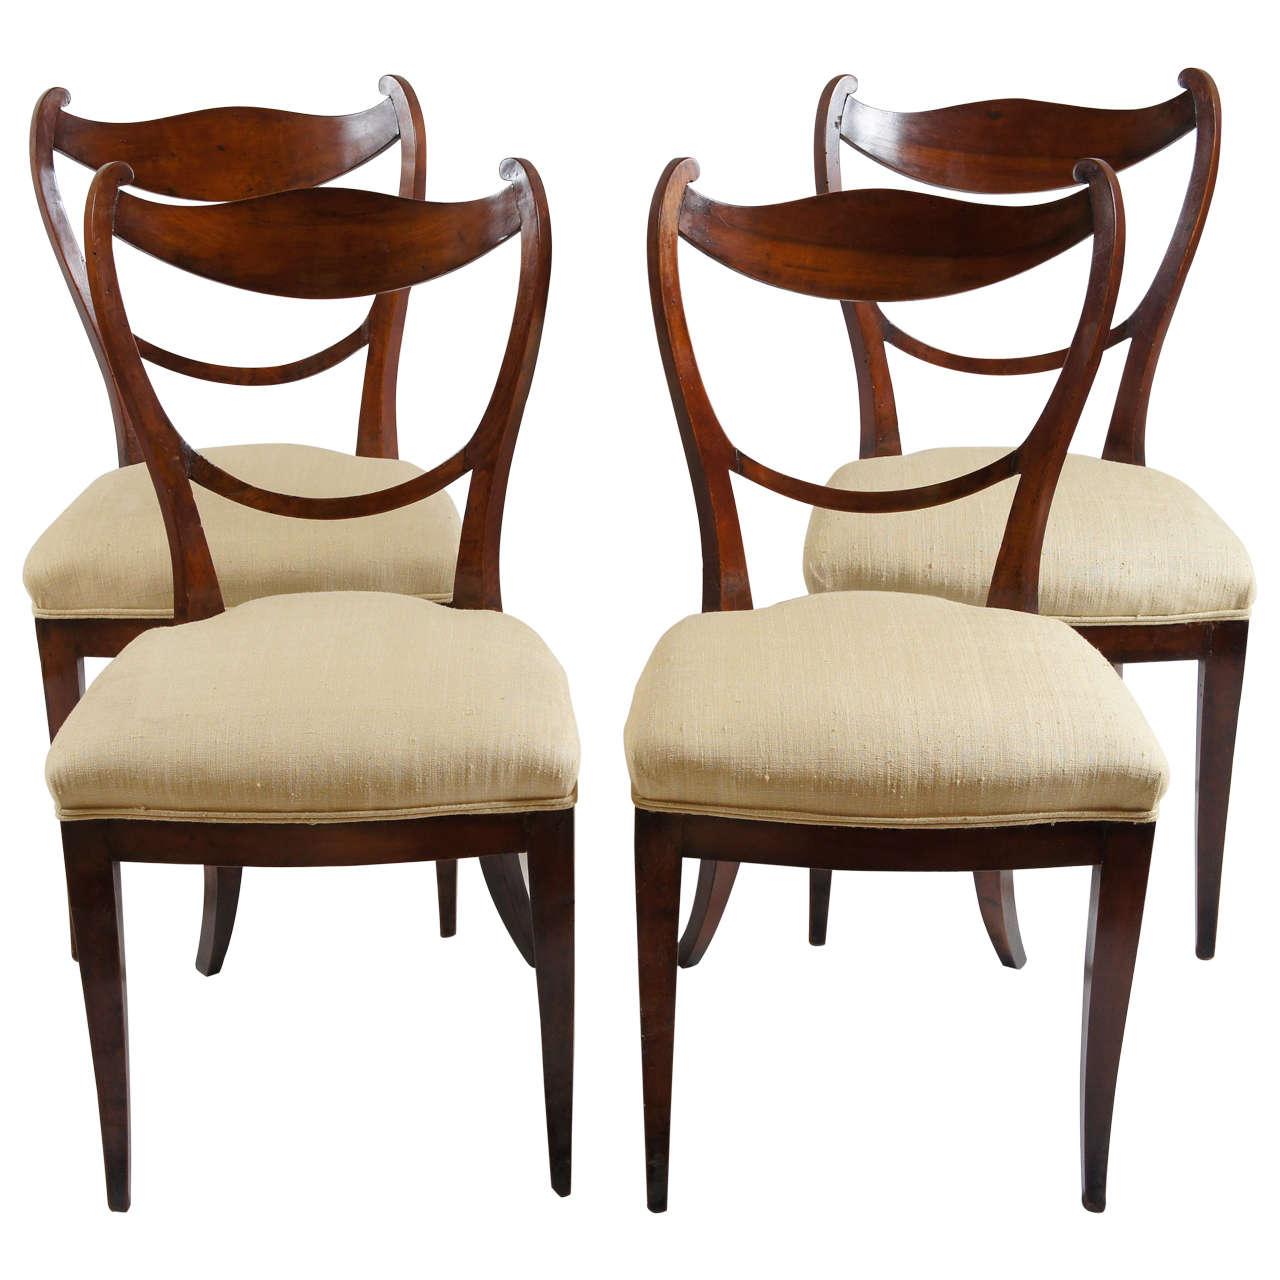 Set Of 4 Biedermeier Chairs Vienna, C. 1830 1